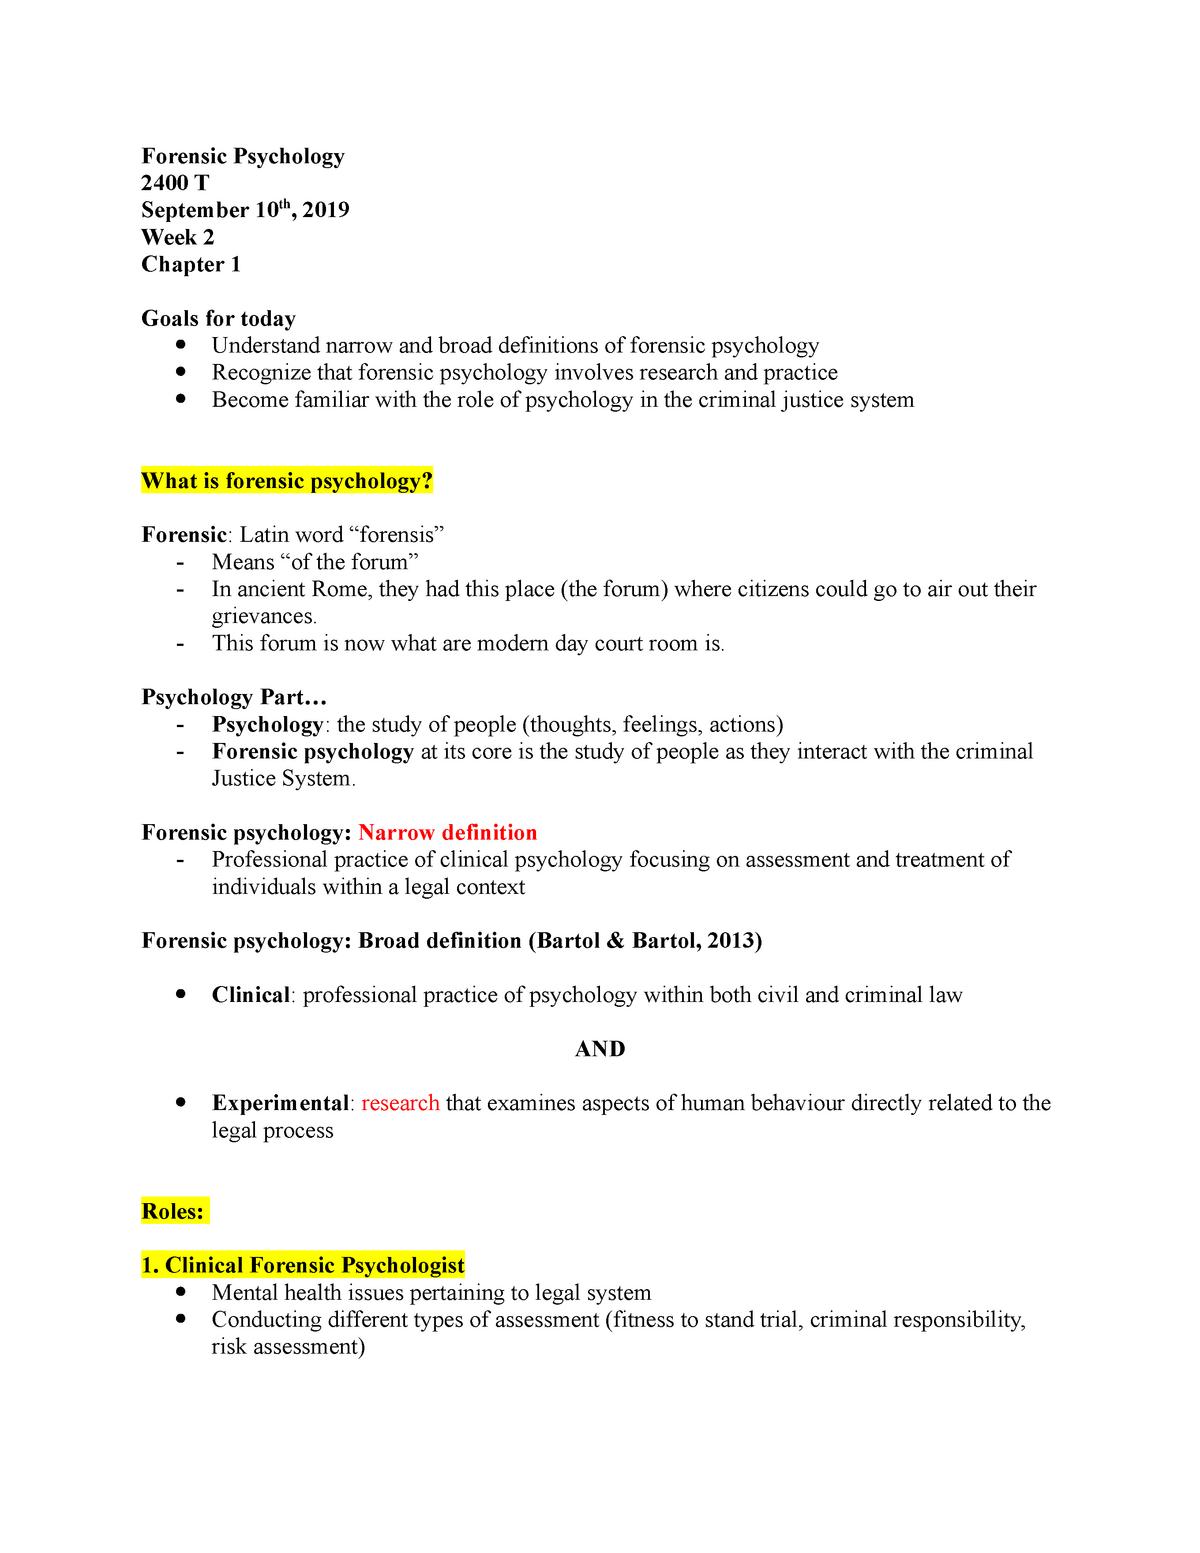 Forensic Psychology 2400 Week 2 Psyc 2400 Carleton Studocu